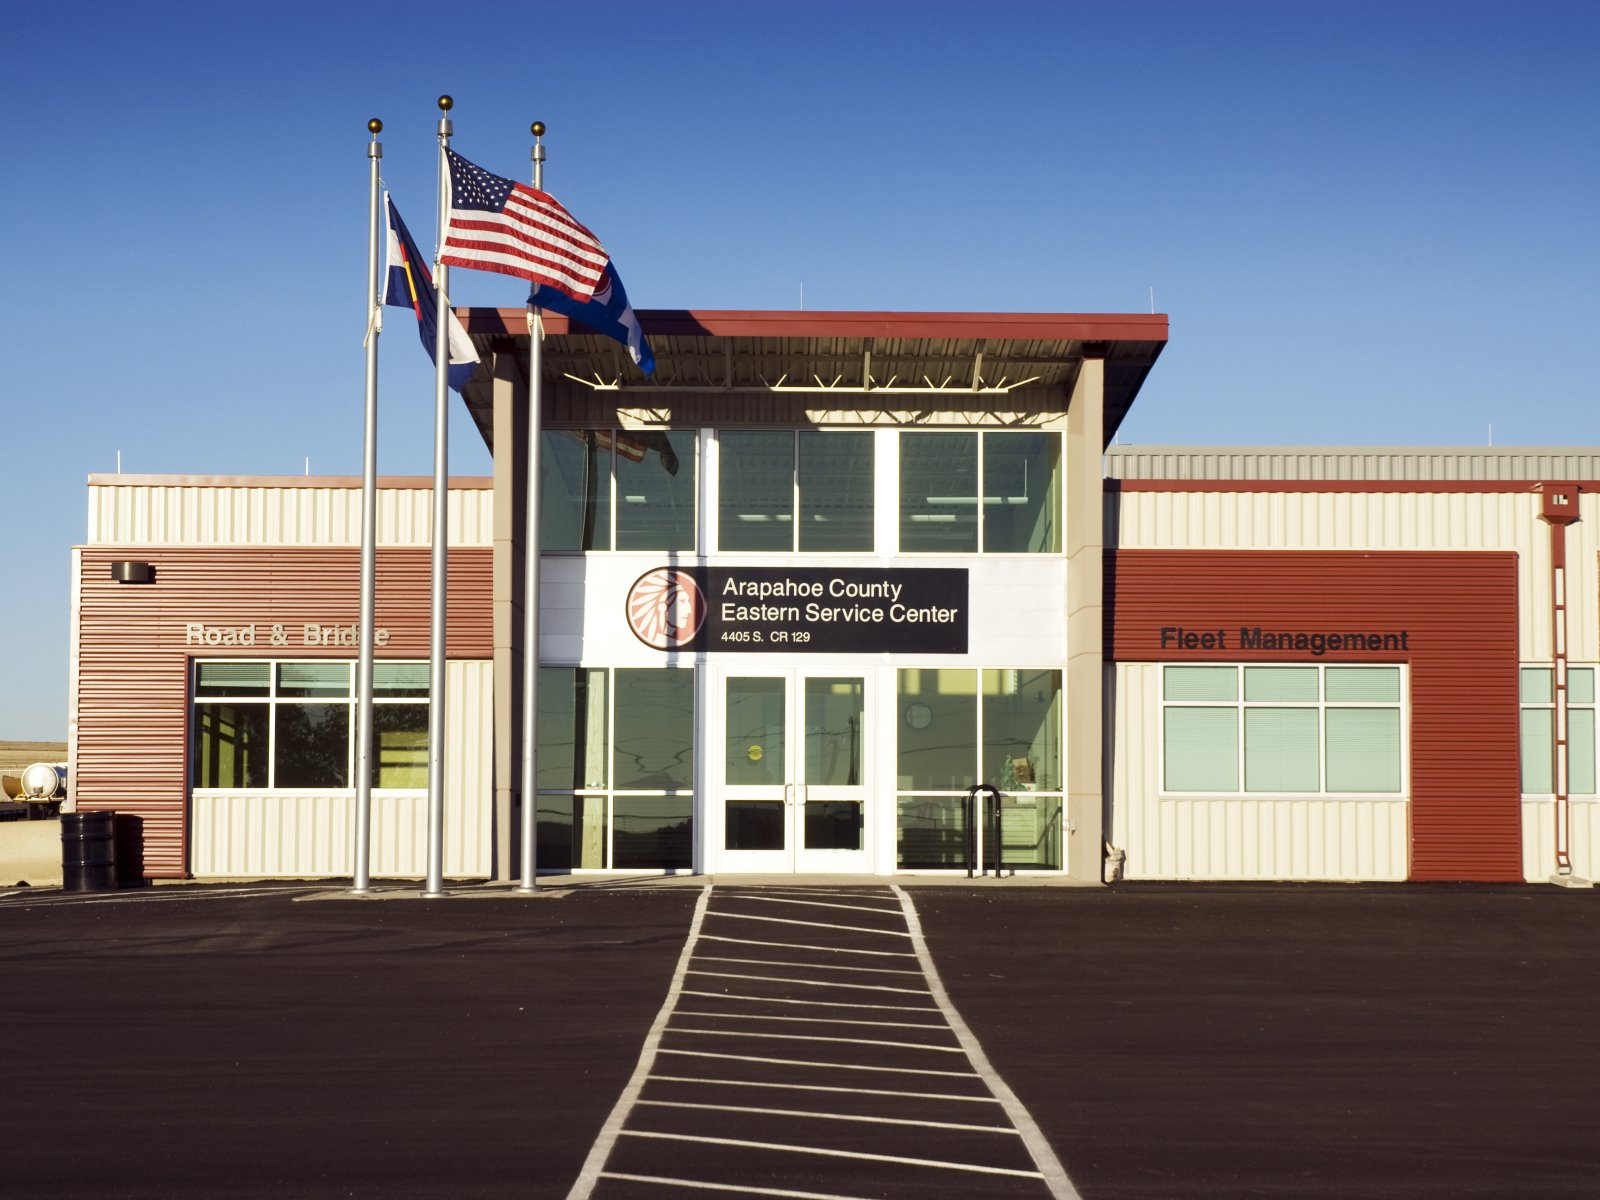 Arapahoe County Eastern Services Center (1)web.jpg